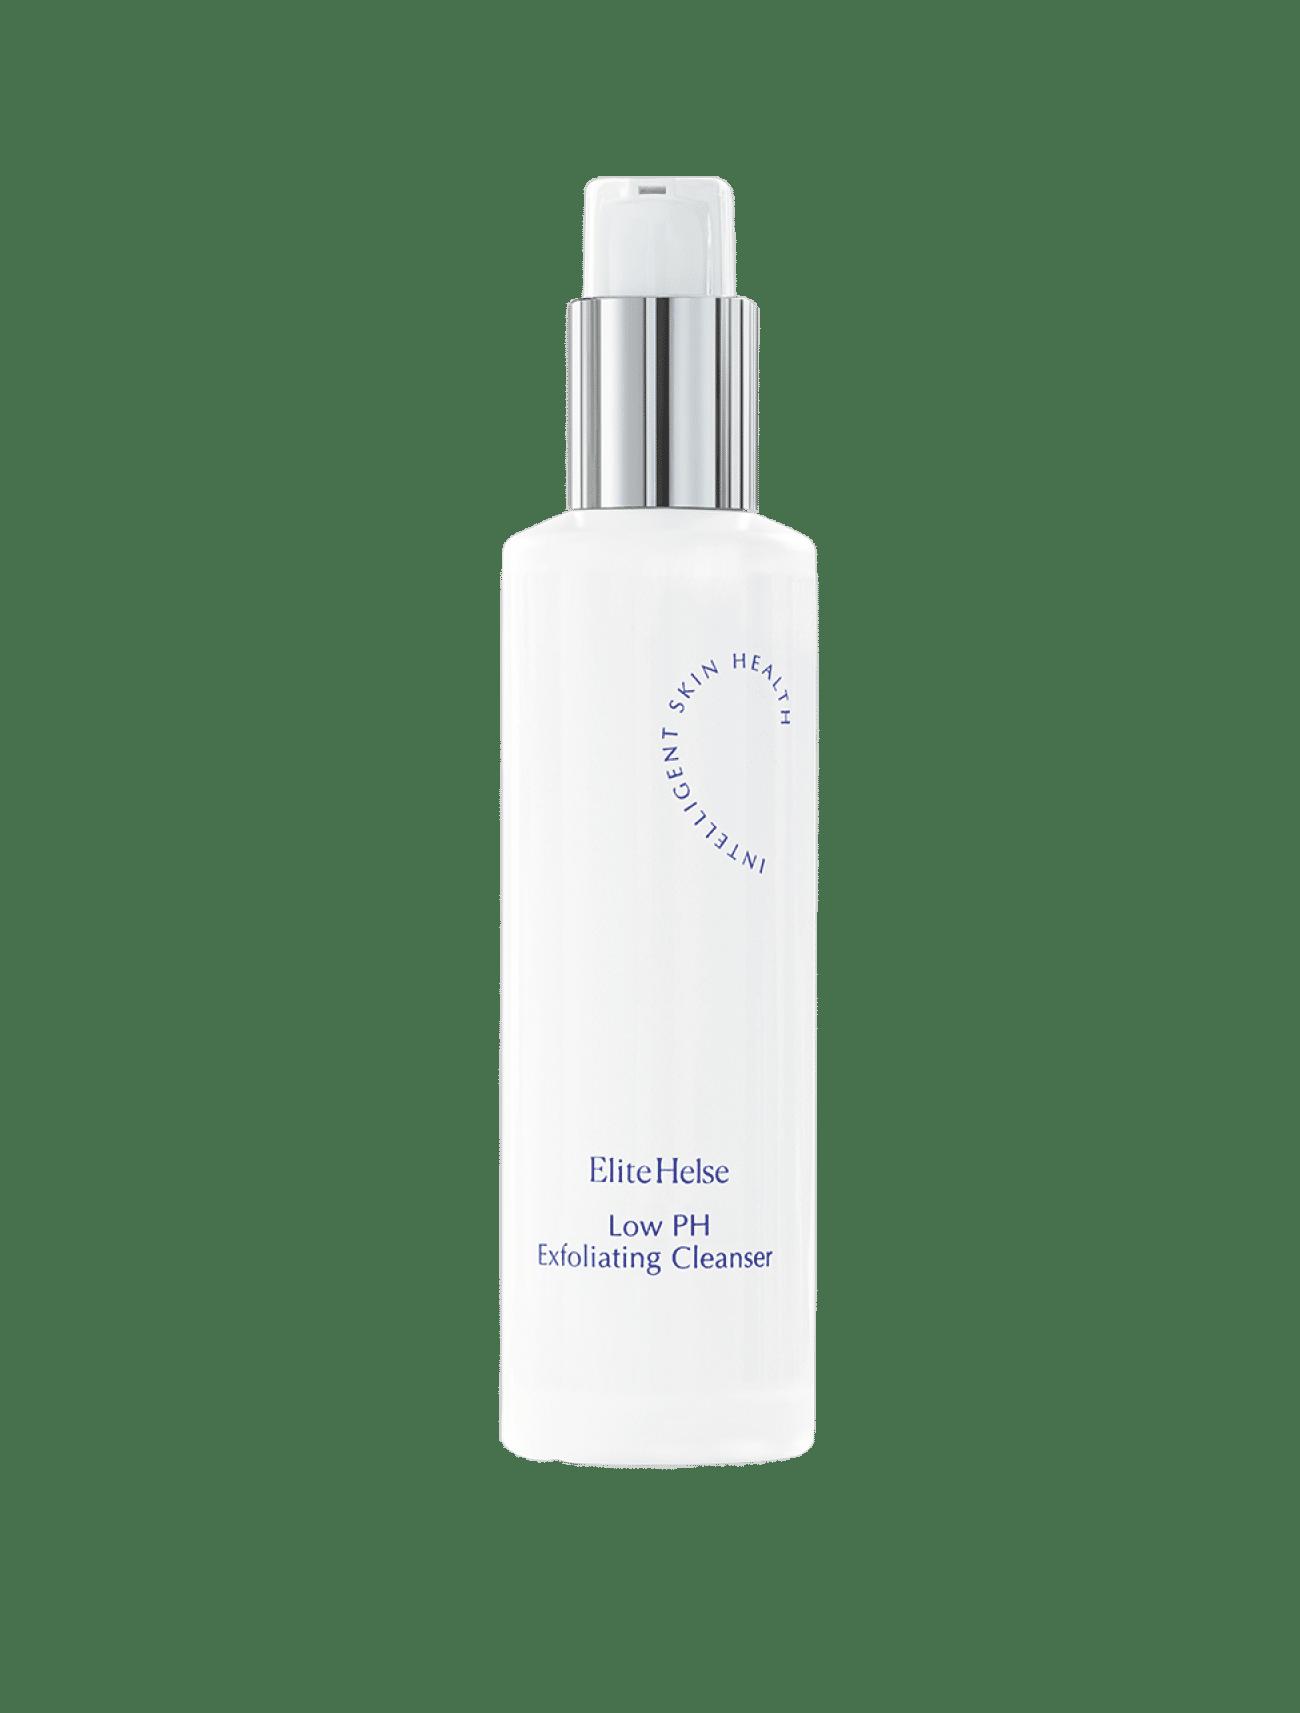 Low PH Exfoliating Cleanser